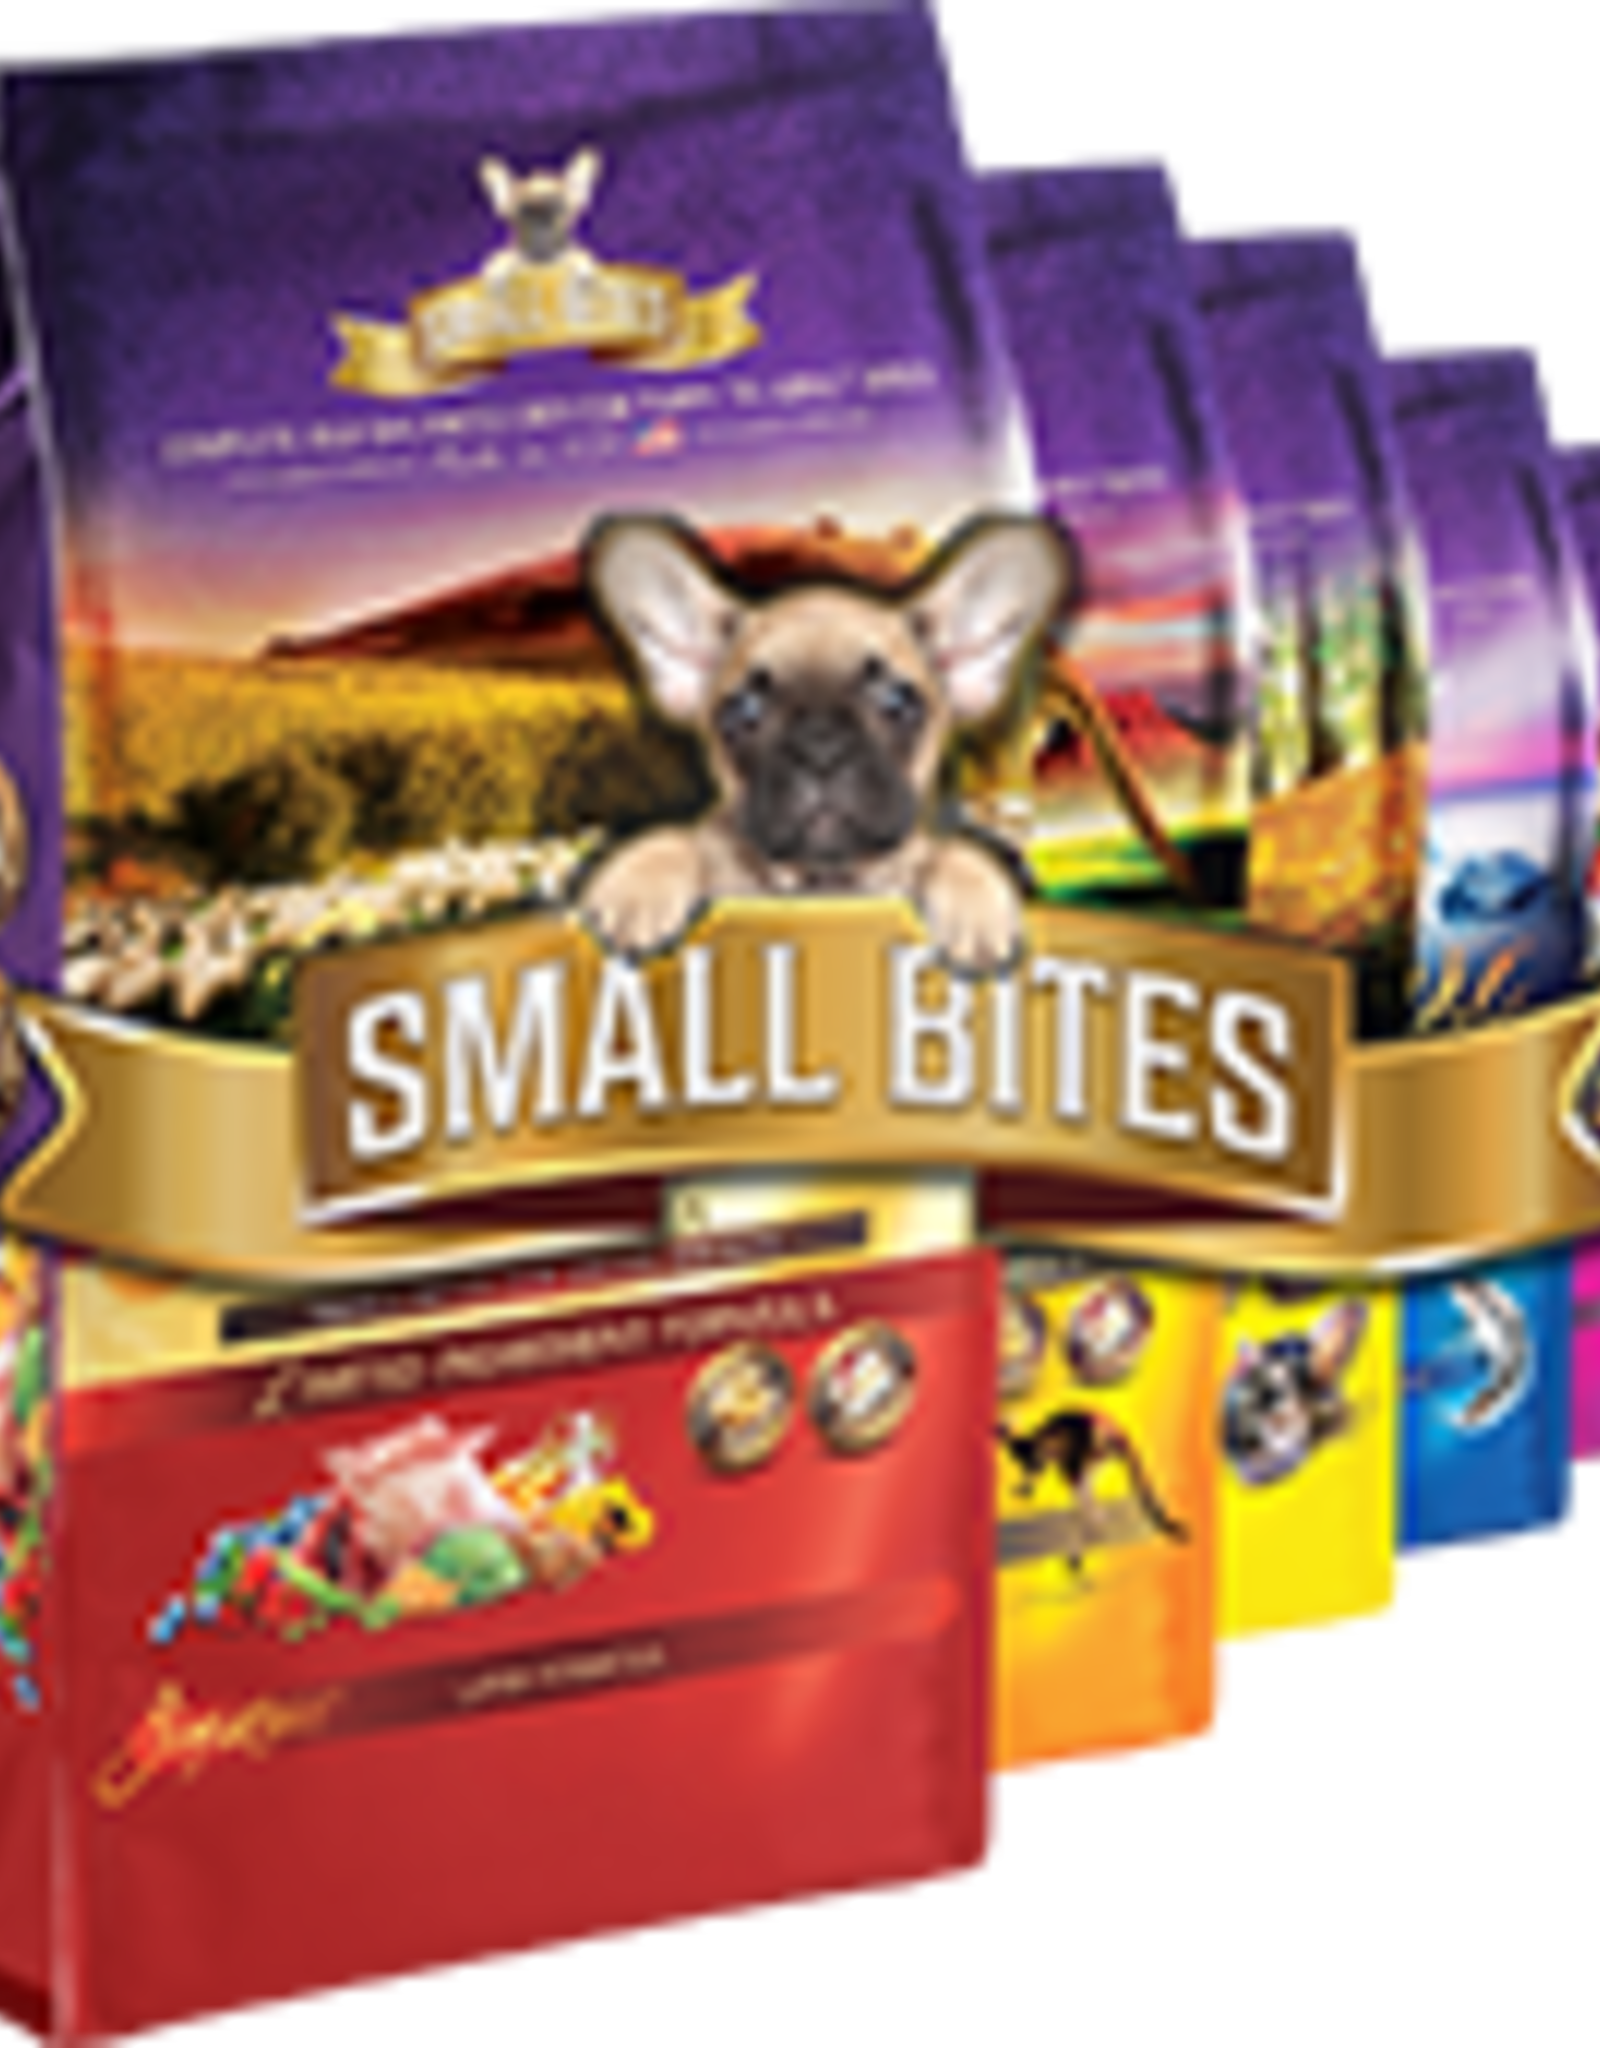 Zignature Zignature Dog Food Trout & Salmon Meal Formula Small Bites